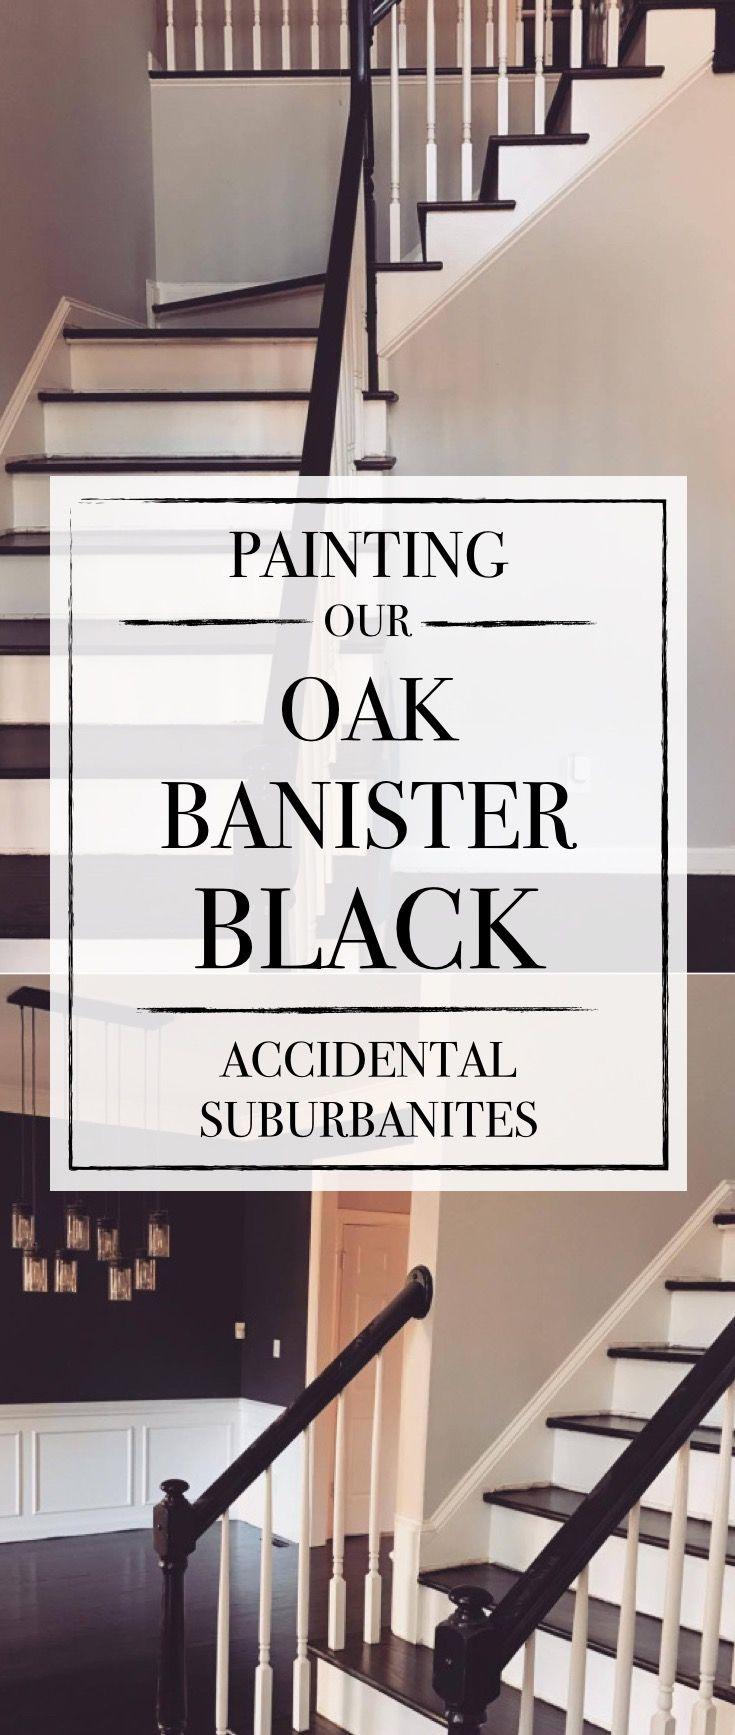 Painting our Oak Banister Hand Railing Black